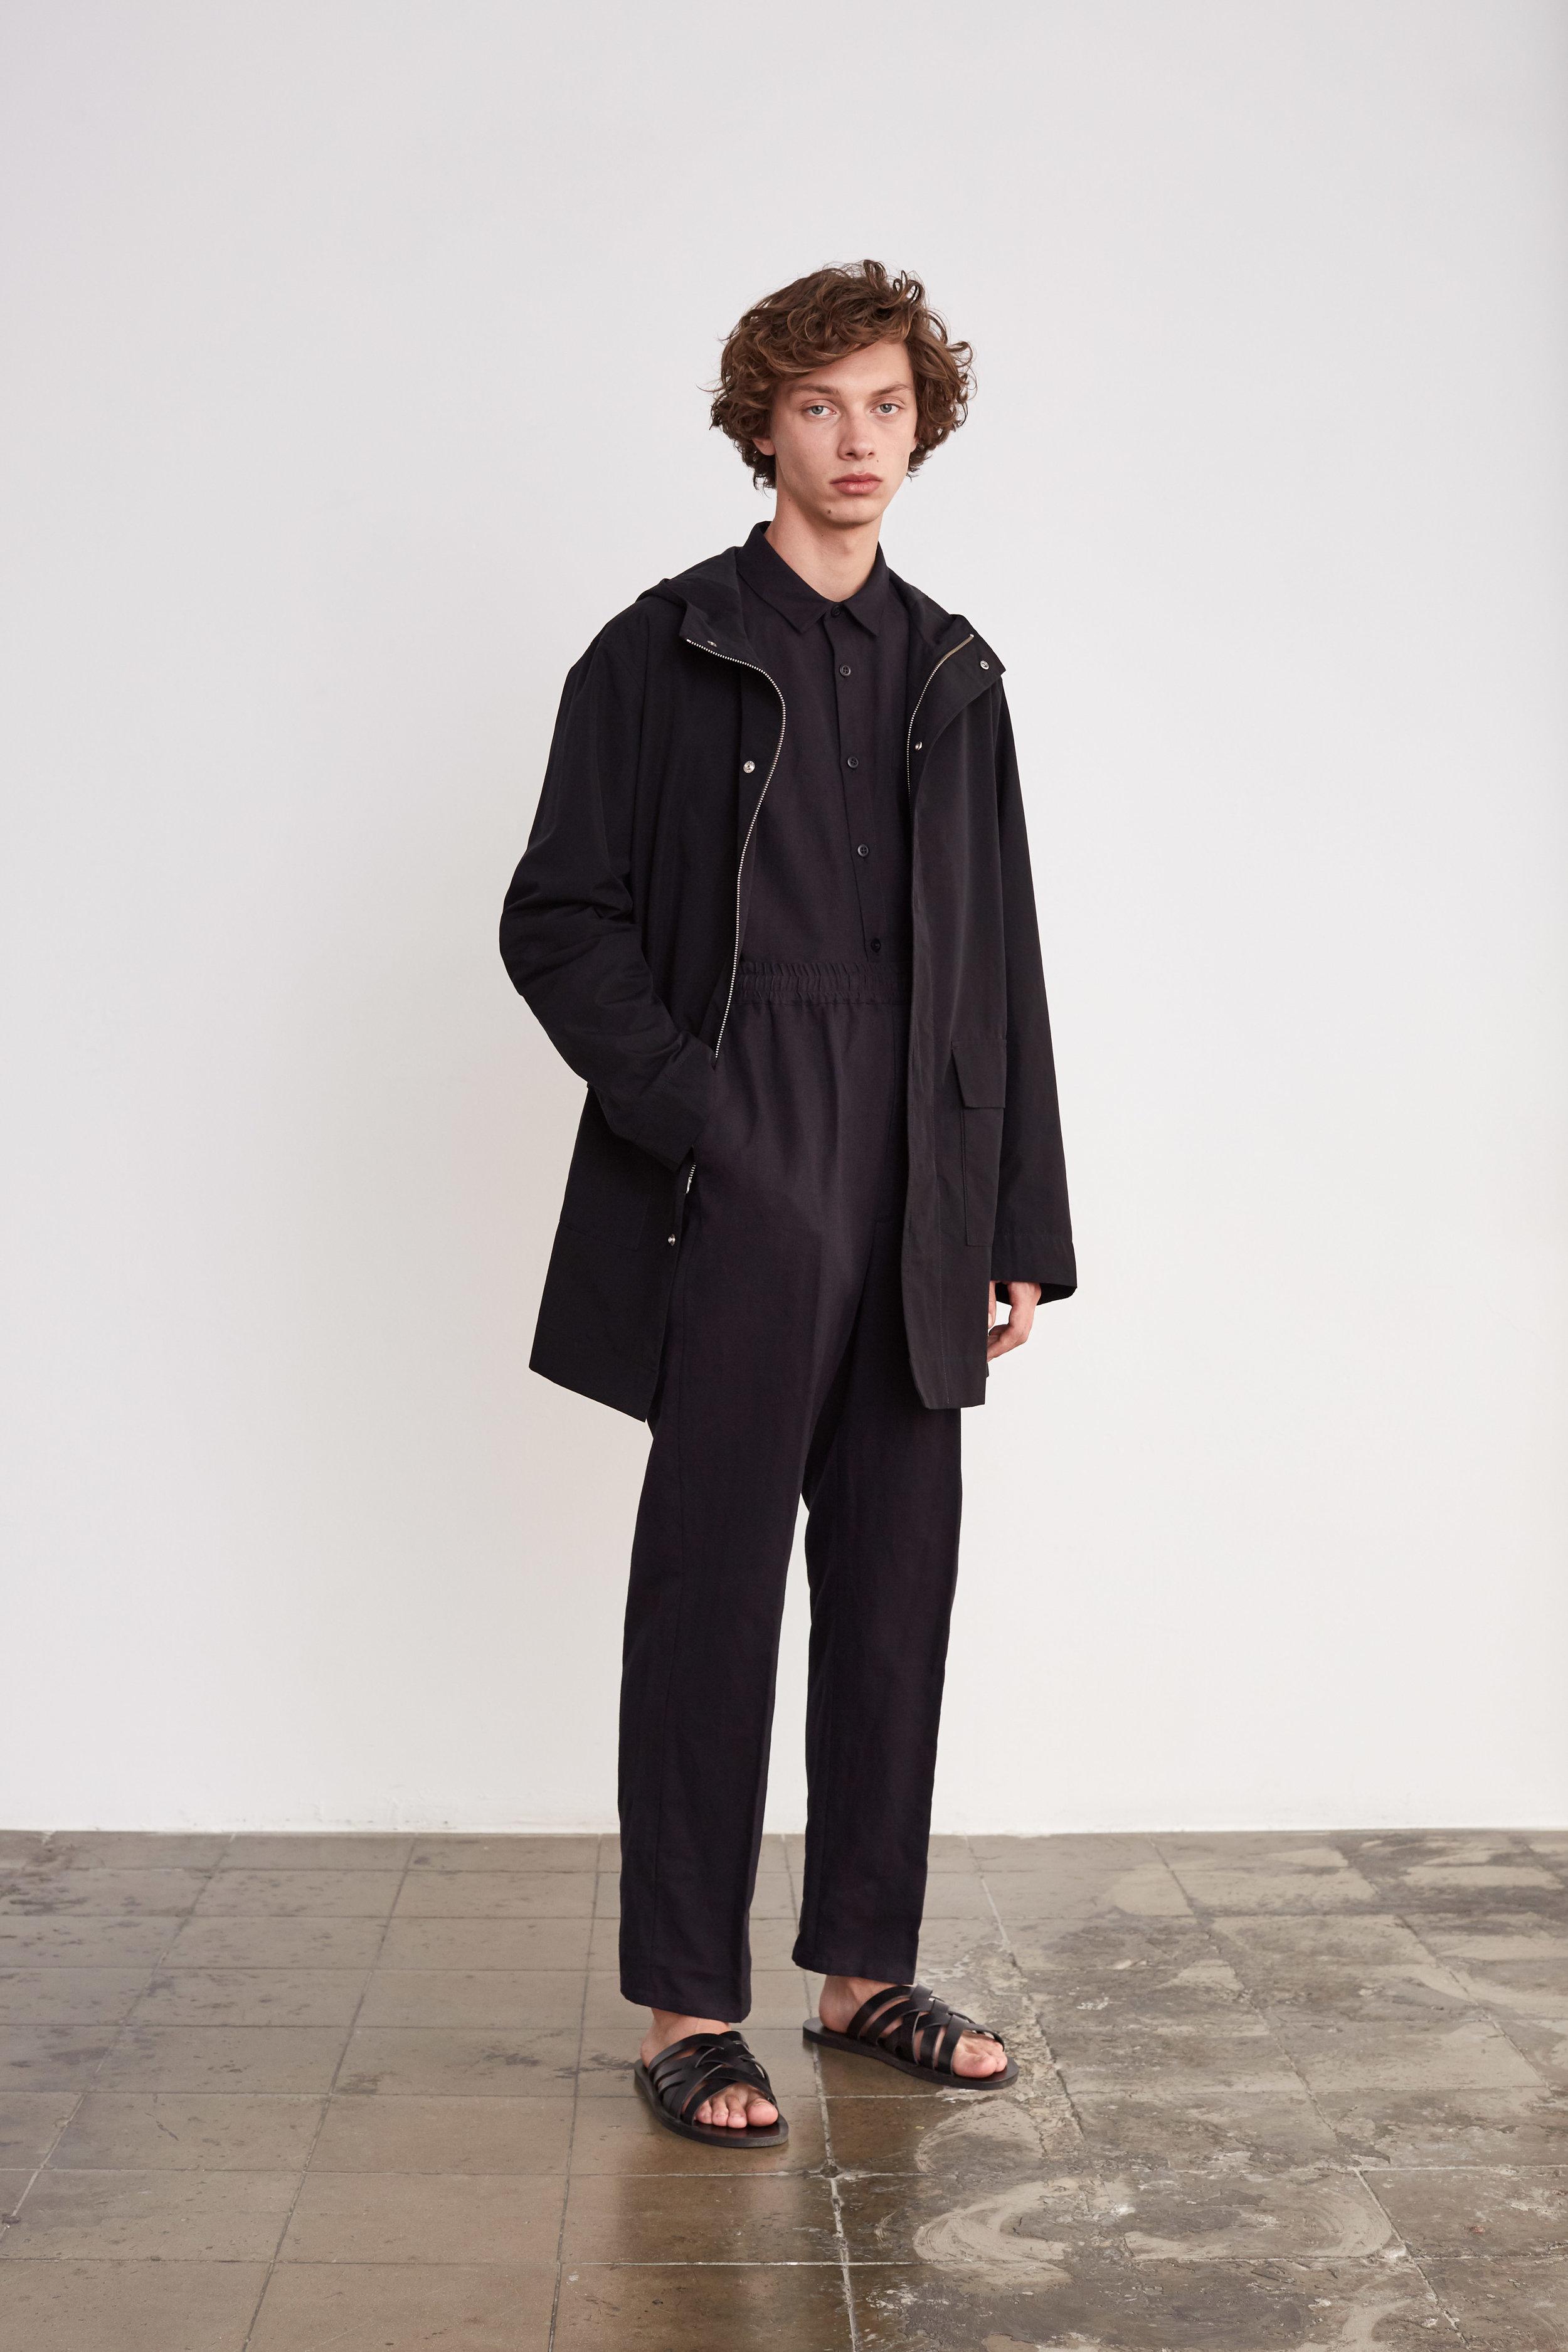 <b>8</b><br>Dylan Cotton/Nylon Jacket<br>Victor Herringbone Shirt<br>Felix Herringbone Pants